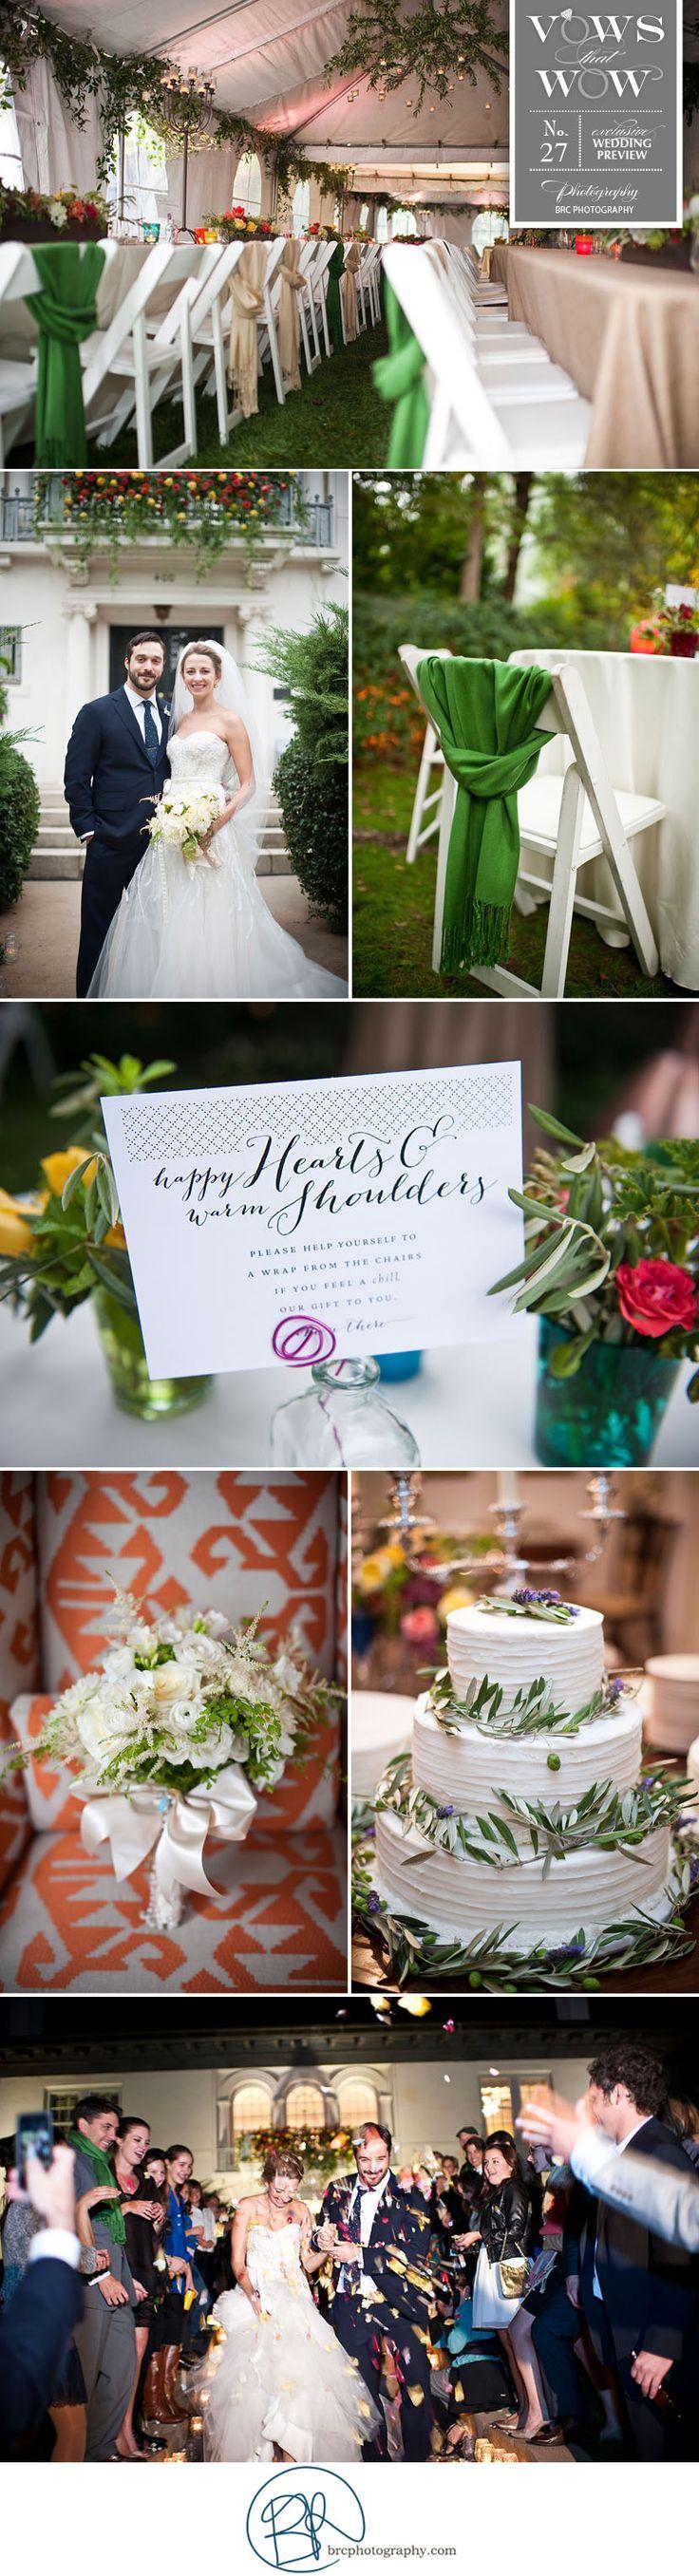 60 best backyard wedding reception ideas images on pinterest